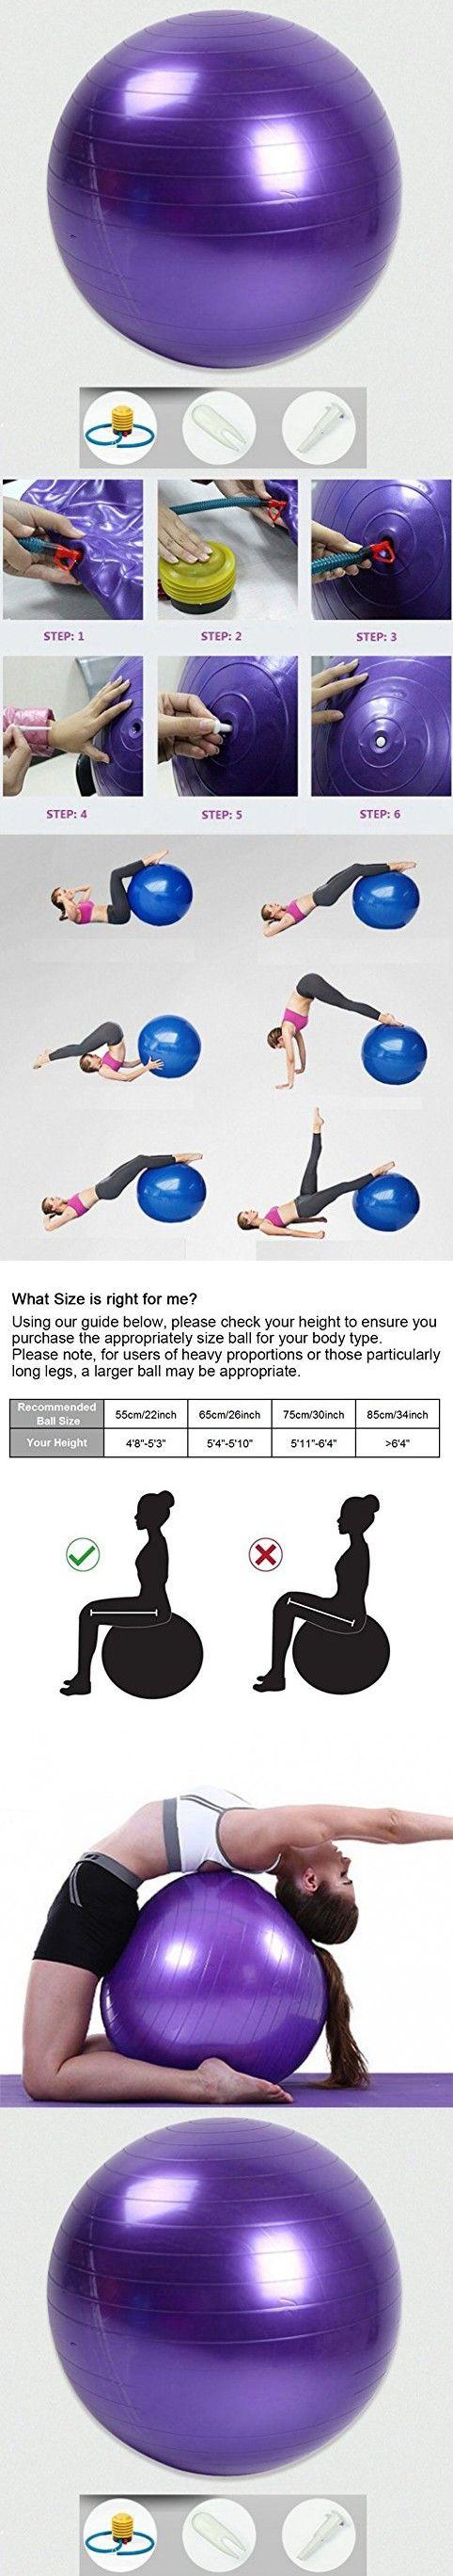 Pilates malibu chair buy malibu chair pilates combo - Dorlaer Exercise Ball Extra Thick Swiss Fitness Yoga Pilate Ball With Pump Plug Kit Anti Burst Balancing Stability Core Cross Training Physical Therapy